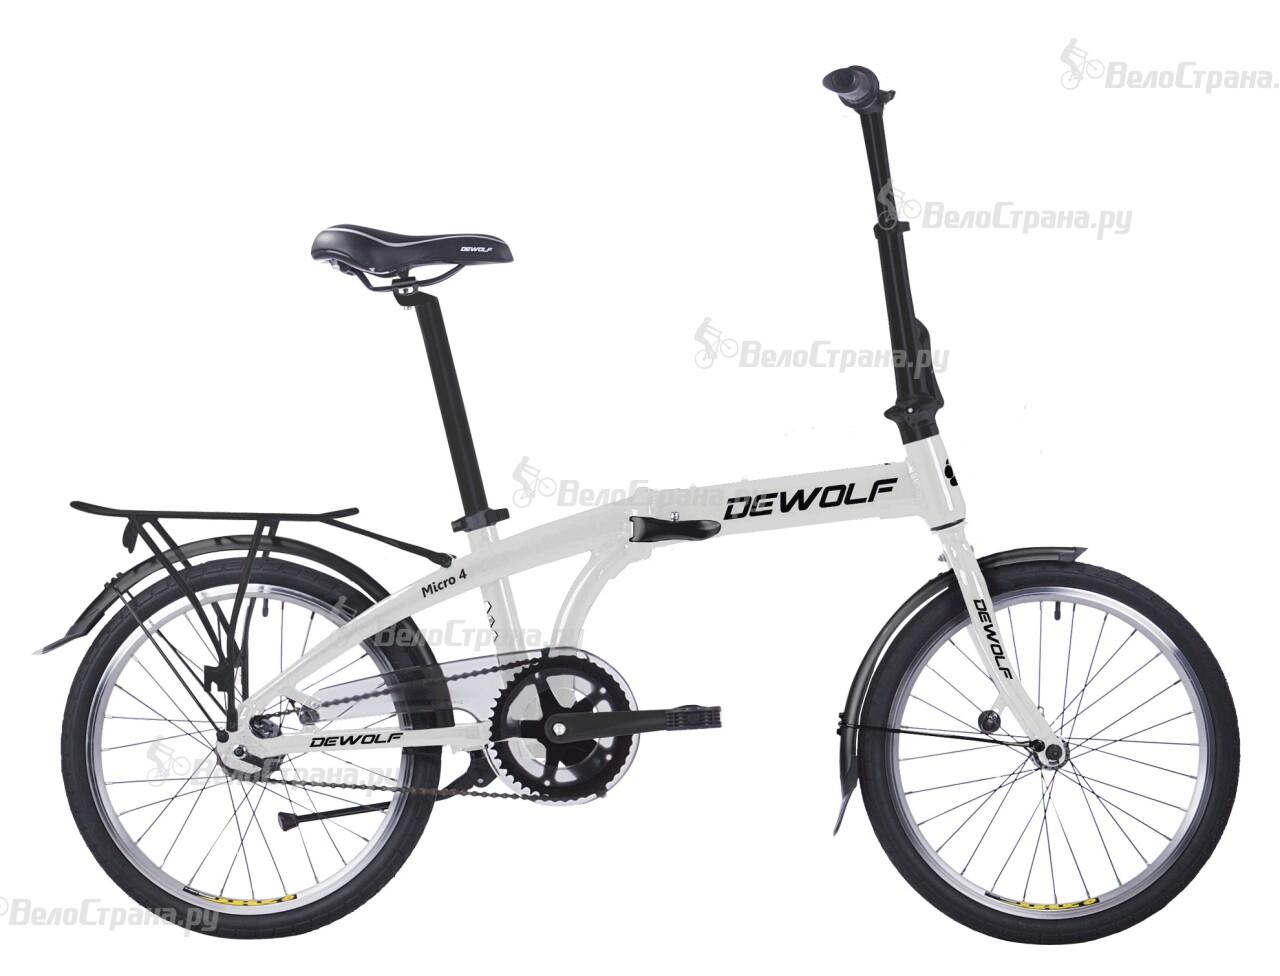 цена на Велосипед Dewolf Micro 4 (2017)